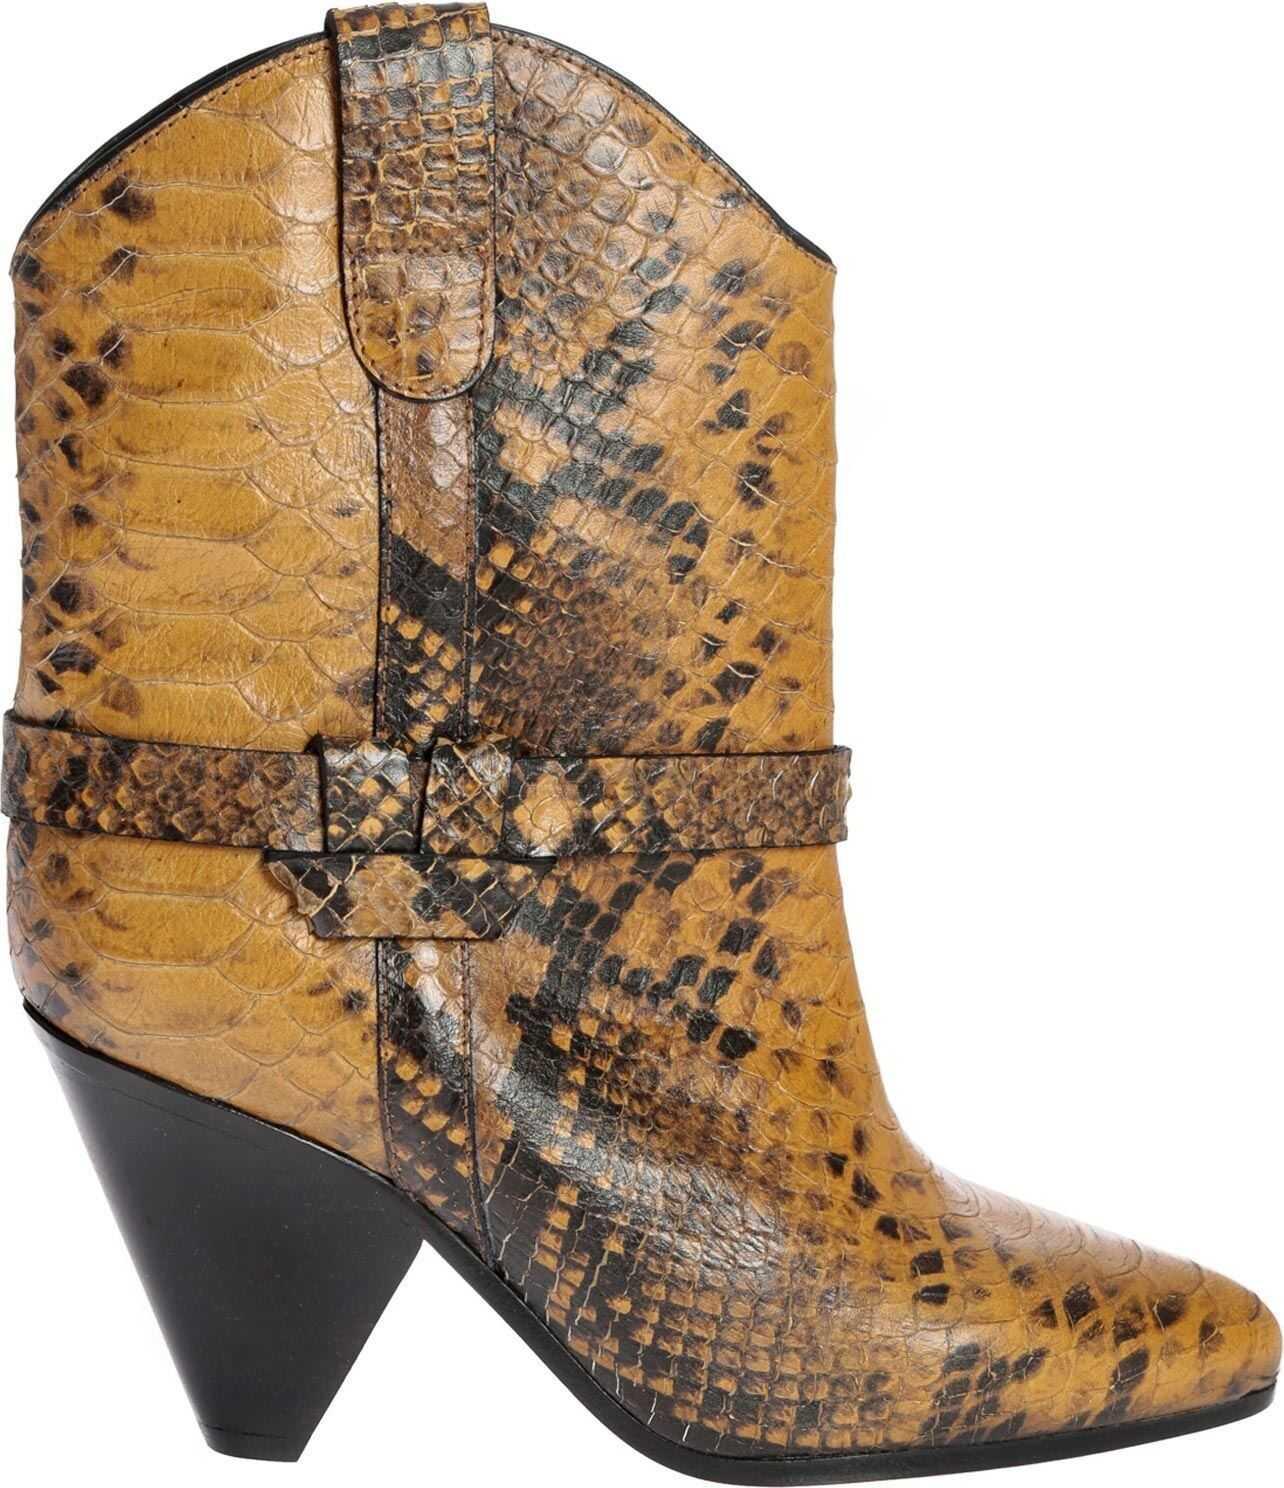 Isabel Marant Deane Animal Printed Ankle Boots Animal print